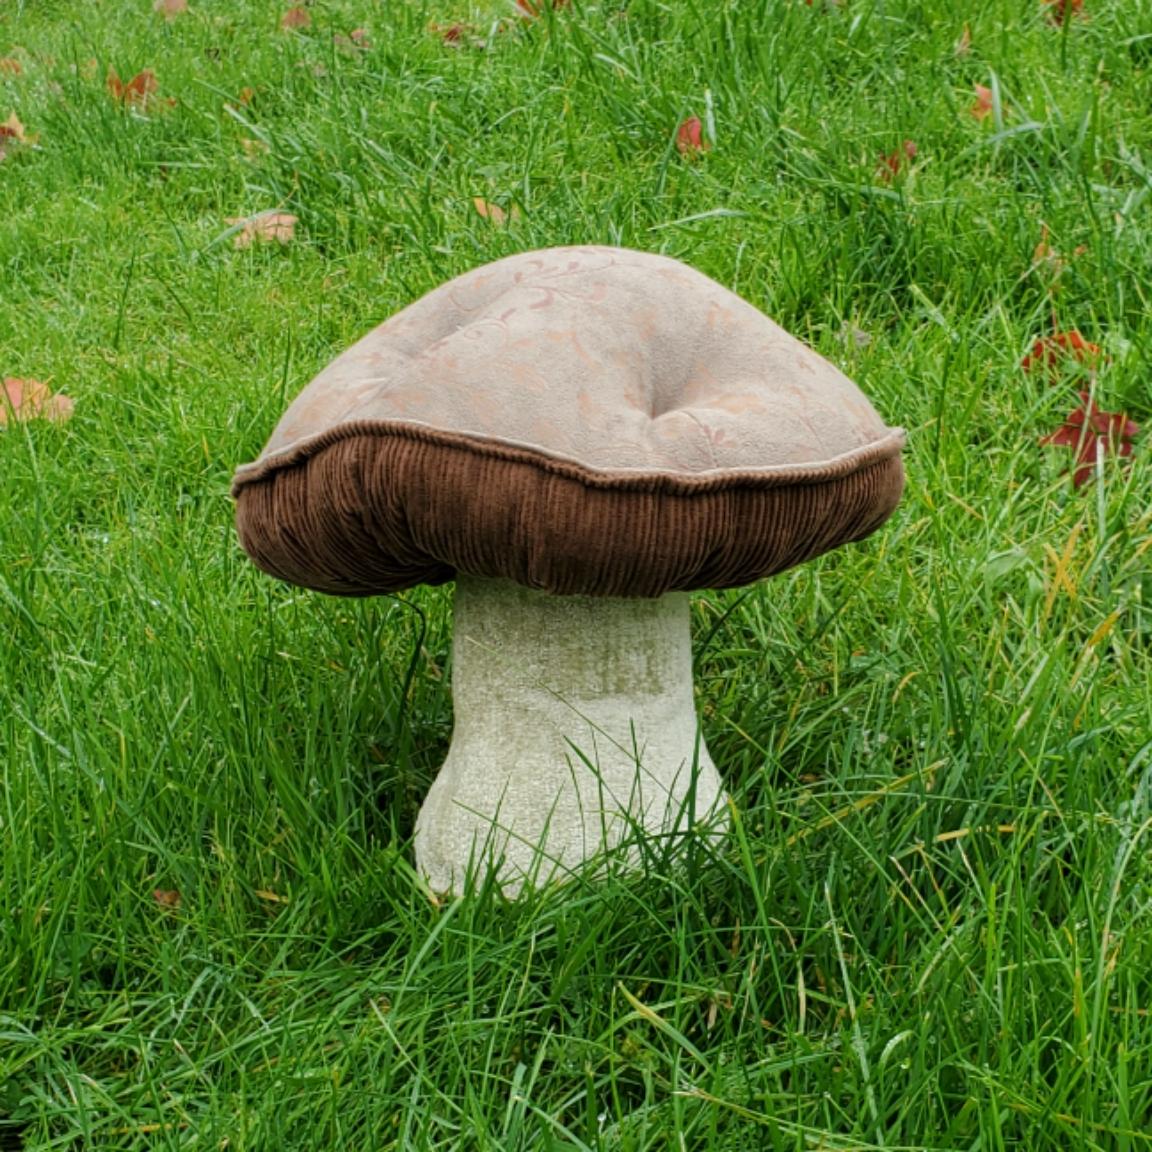 Grassy lawn mushroom instagram favorite.